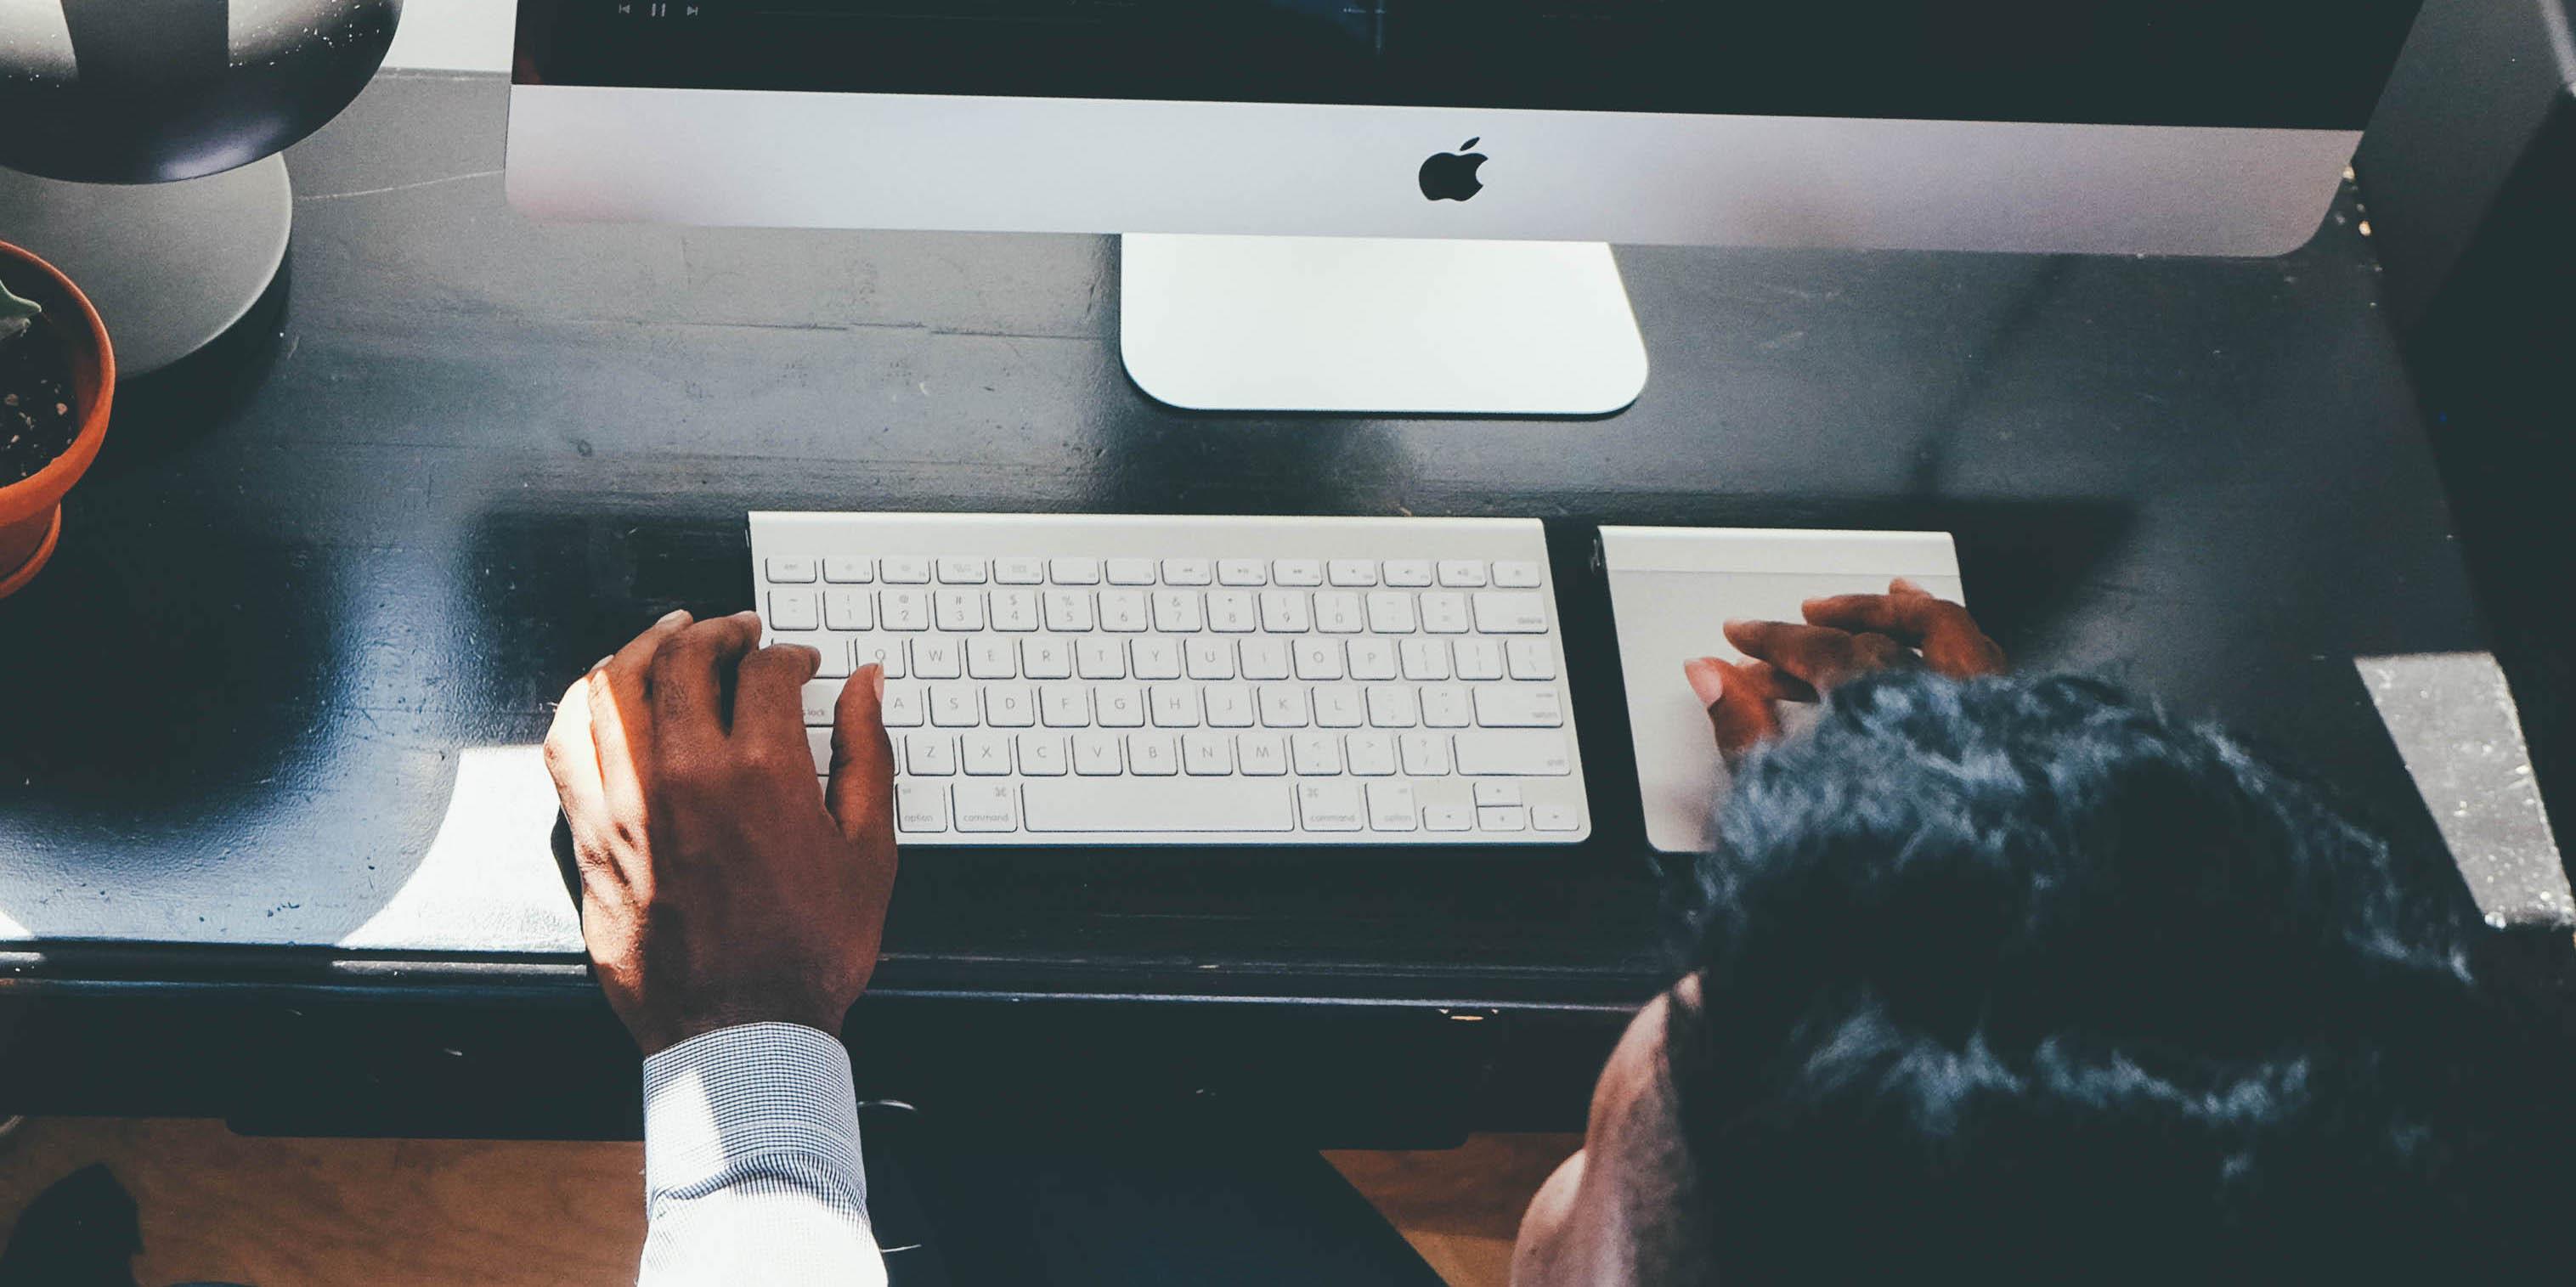 Person sitting at a desk, looking at computer monitor